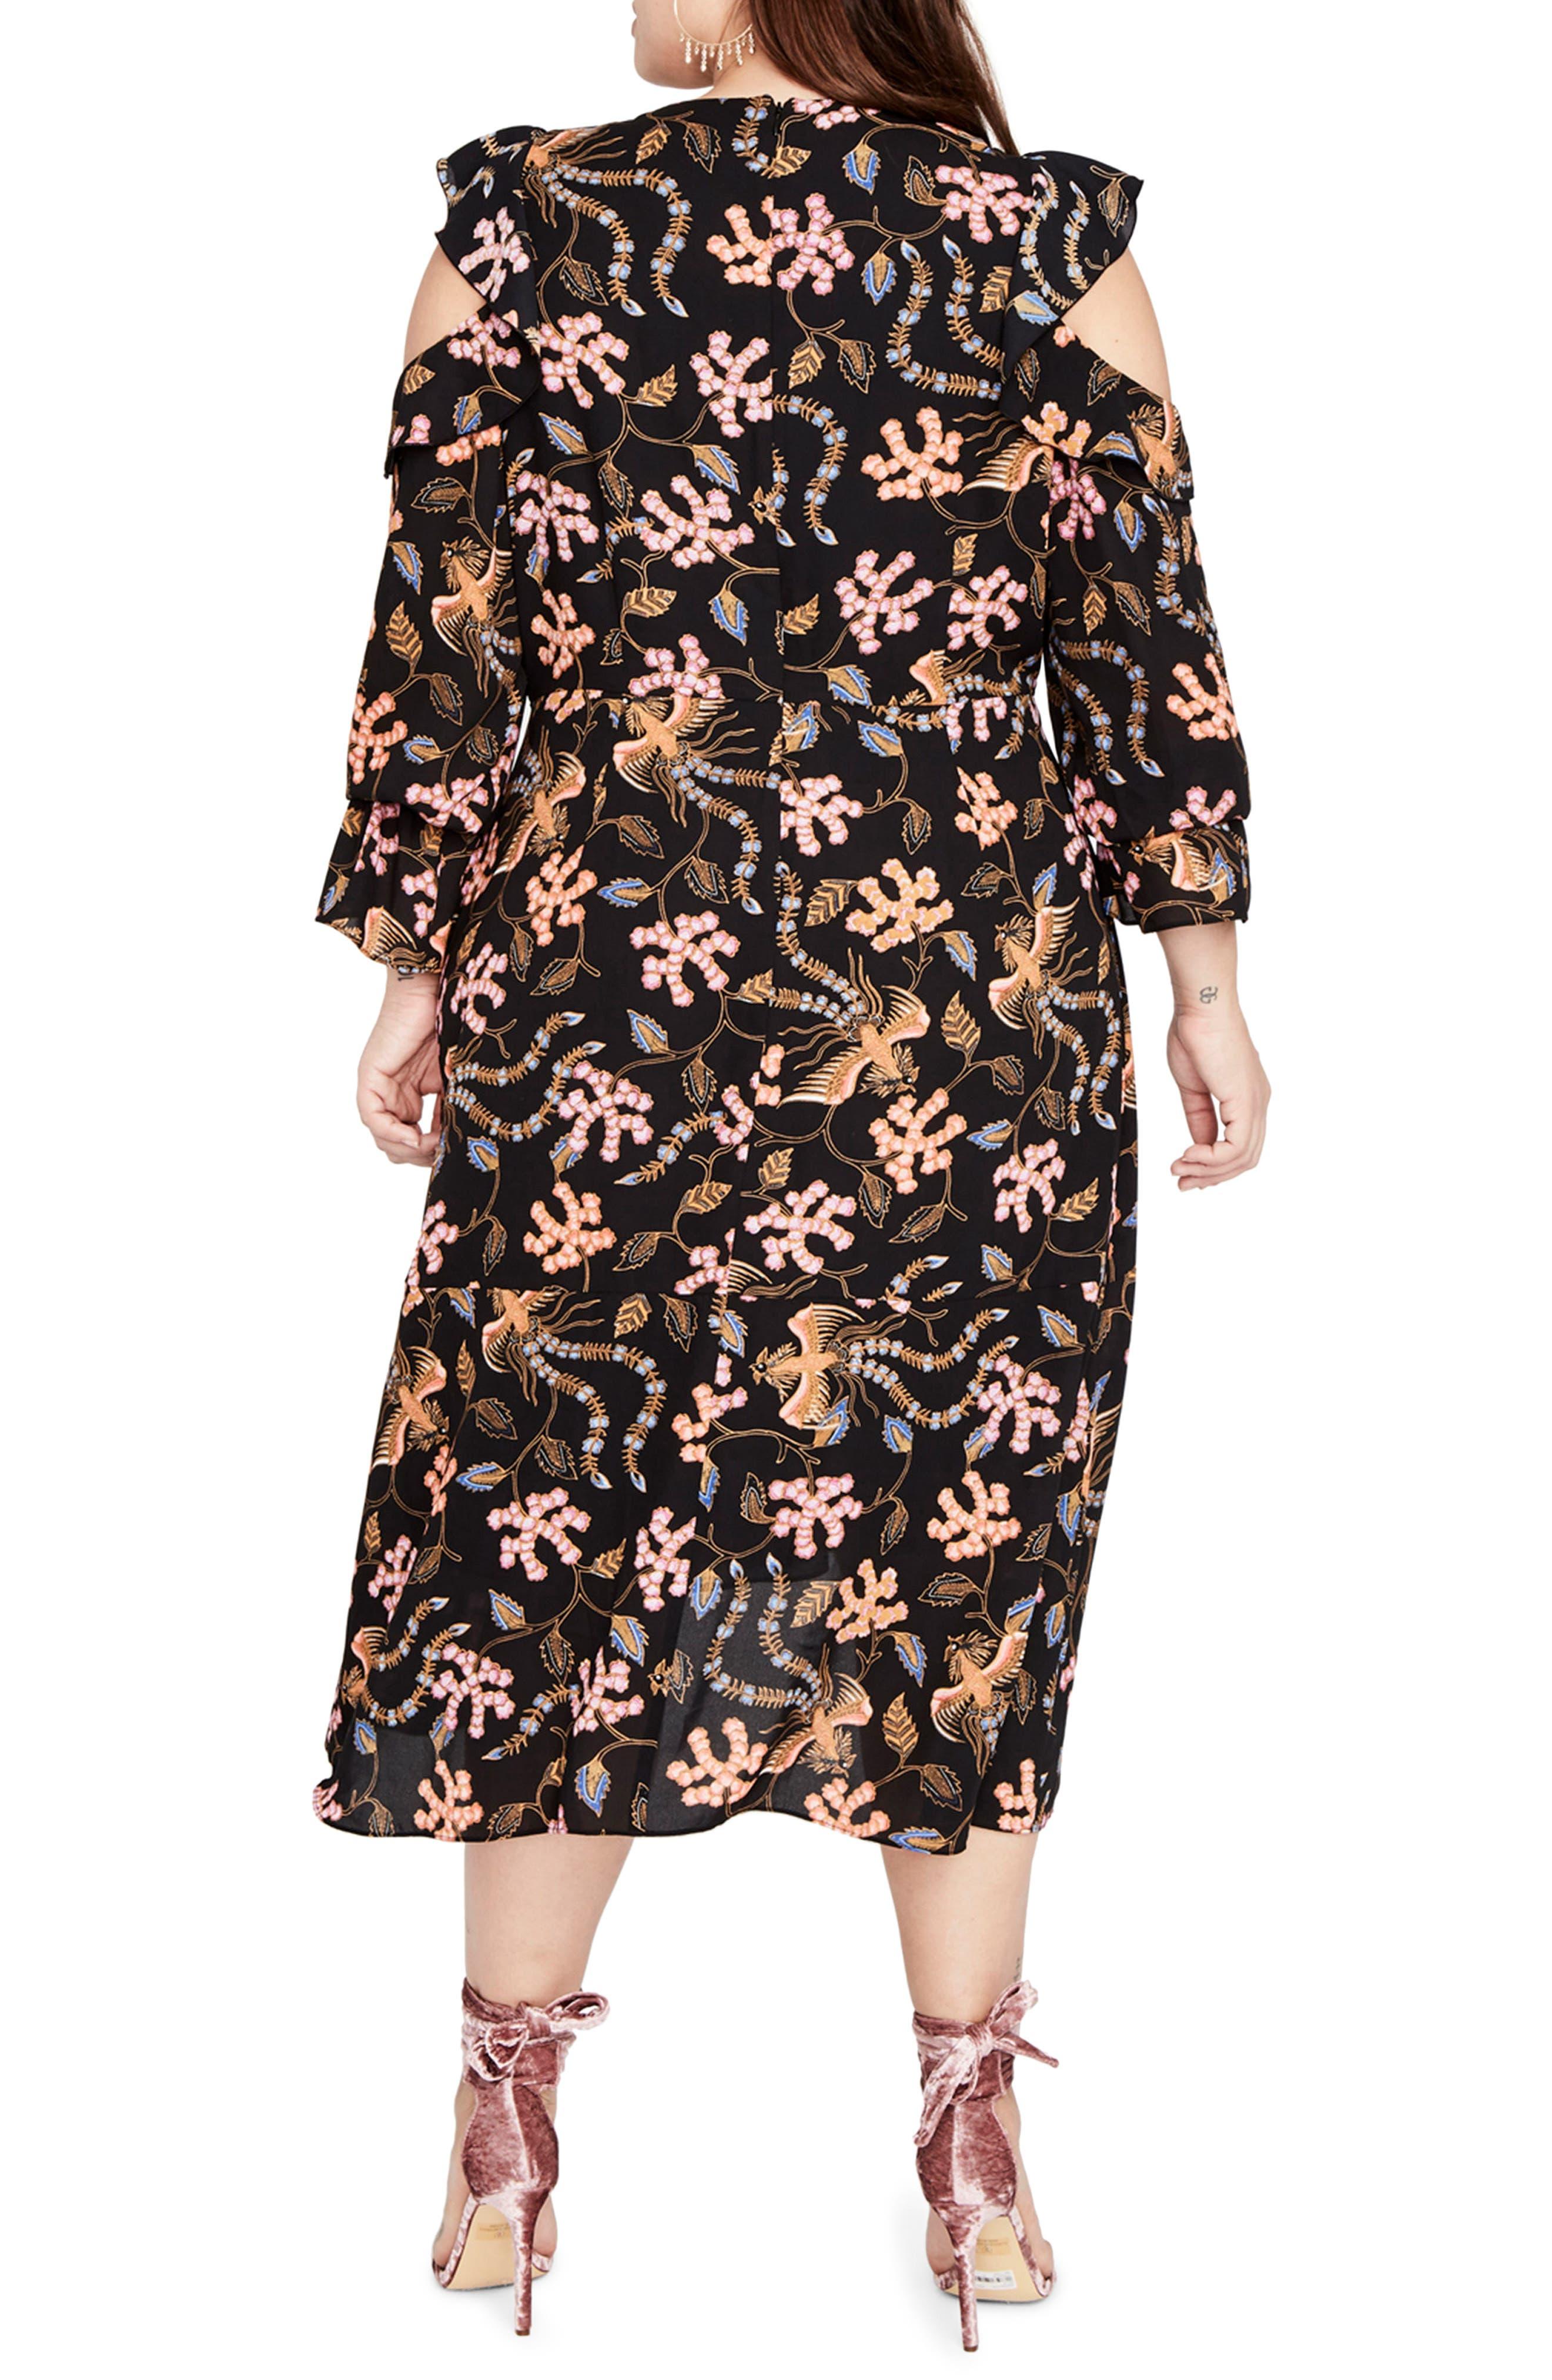 RACHEL BY Rachel Roy Cold Shoulder Ruffle Midi Dress,                             Alternate thumbnail 2, color,                             012